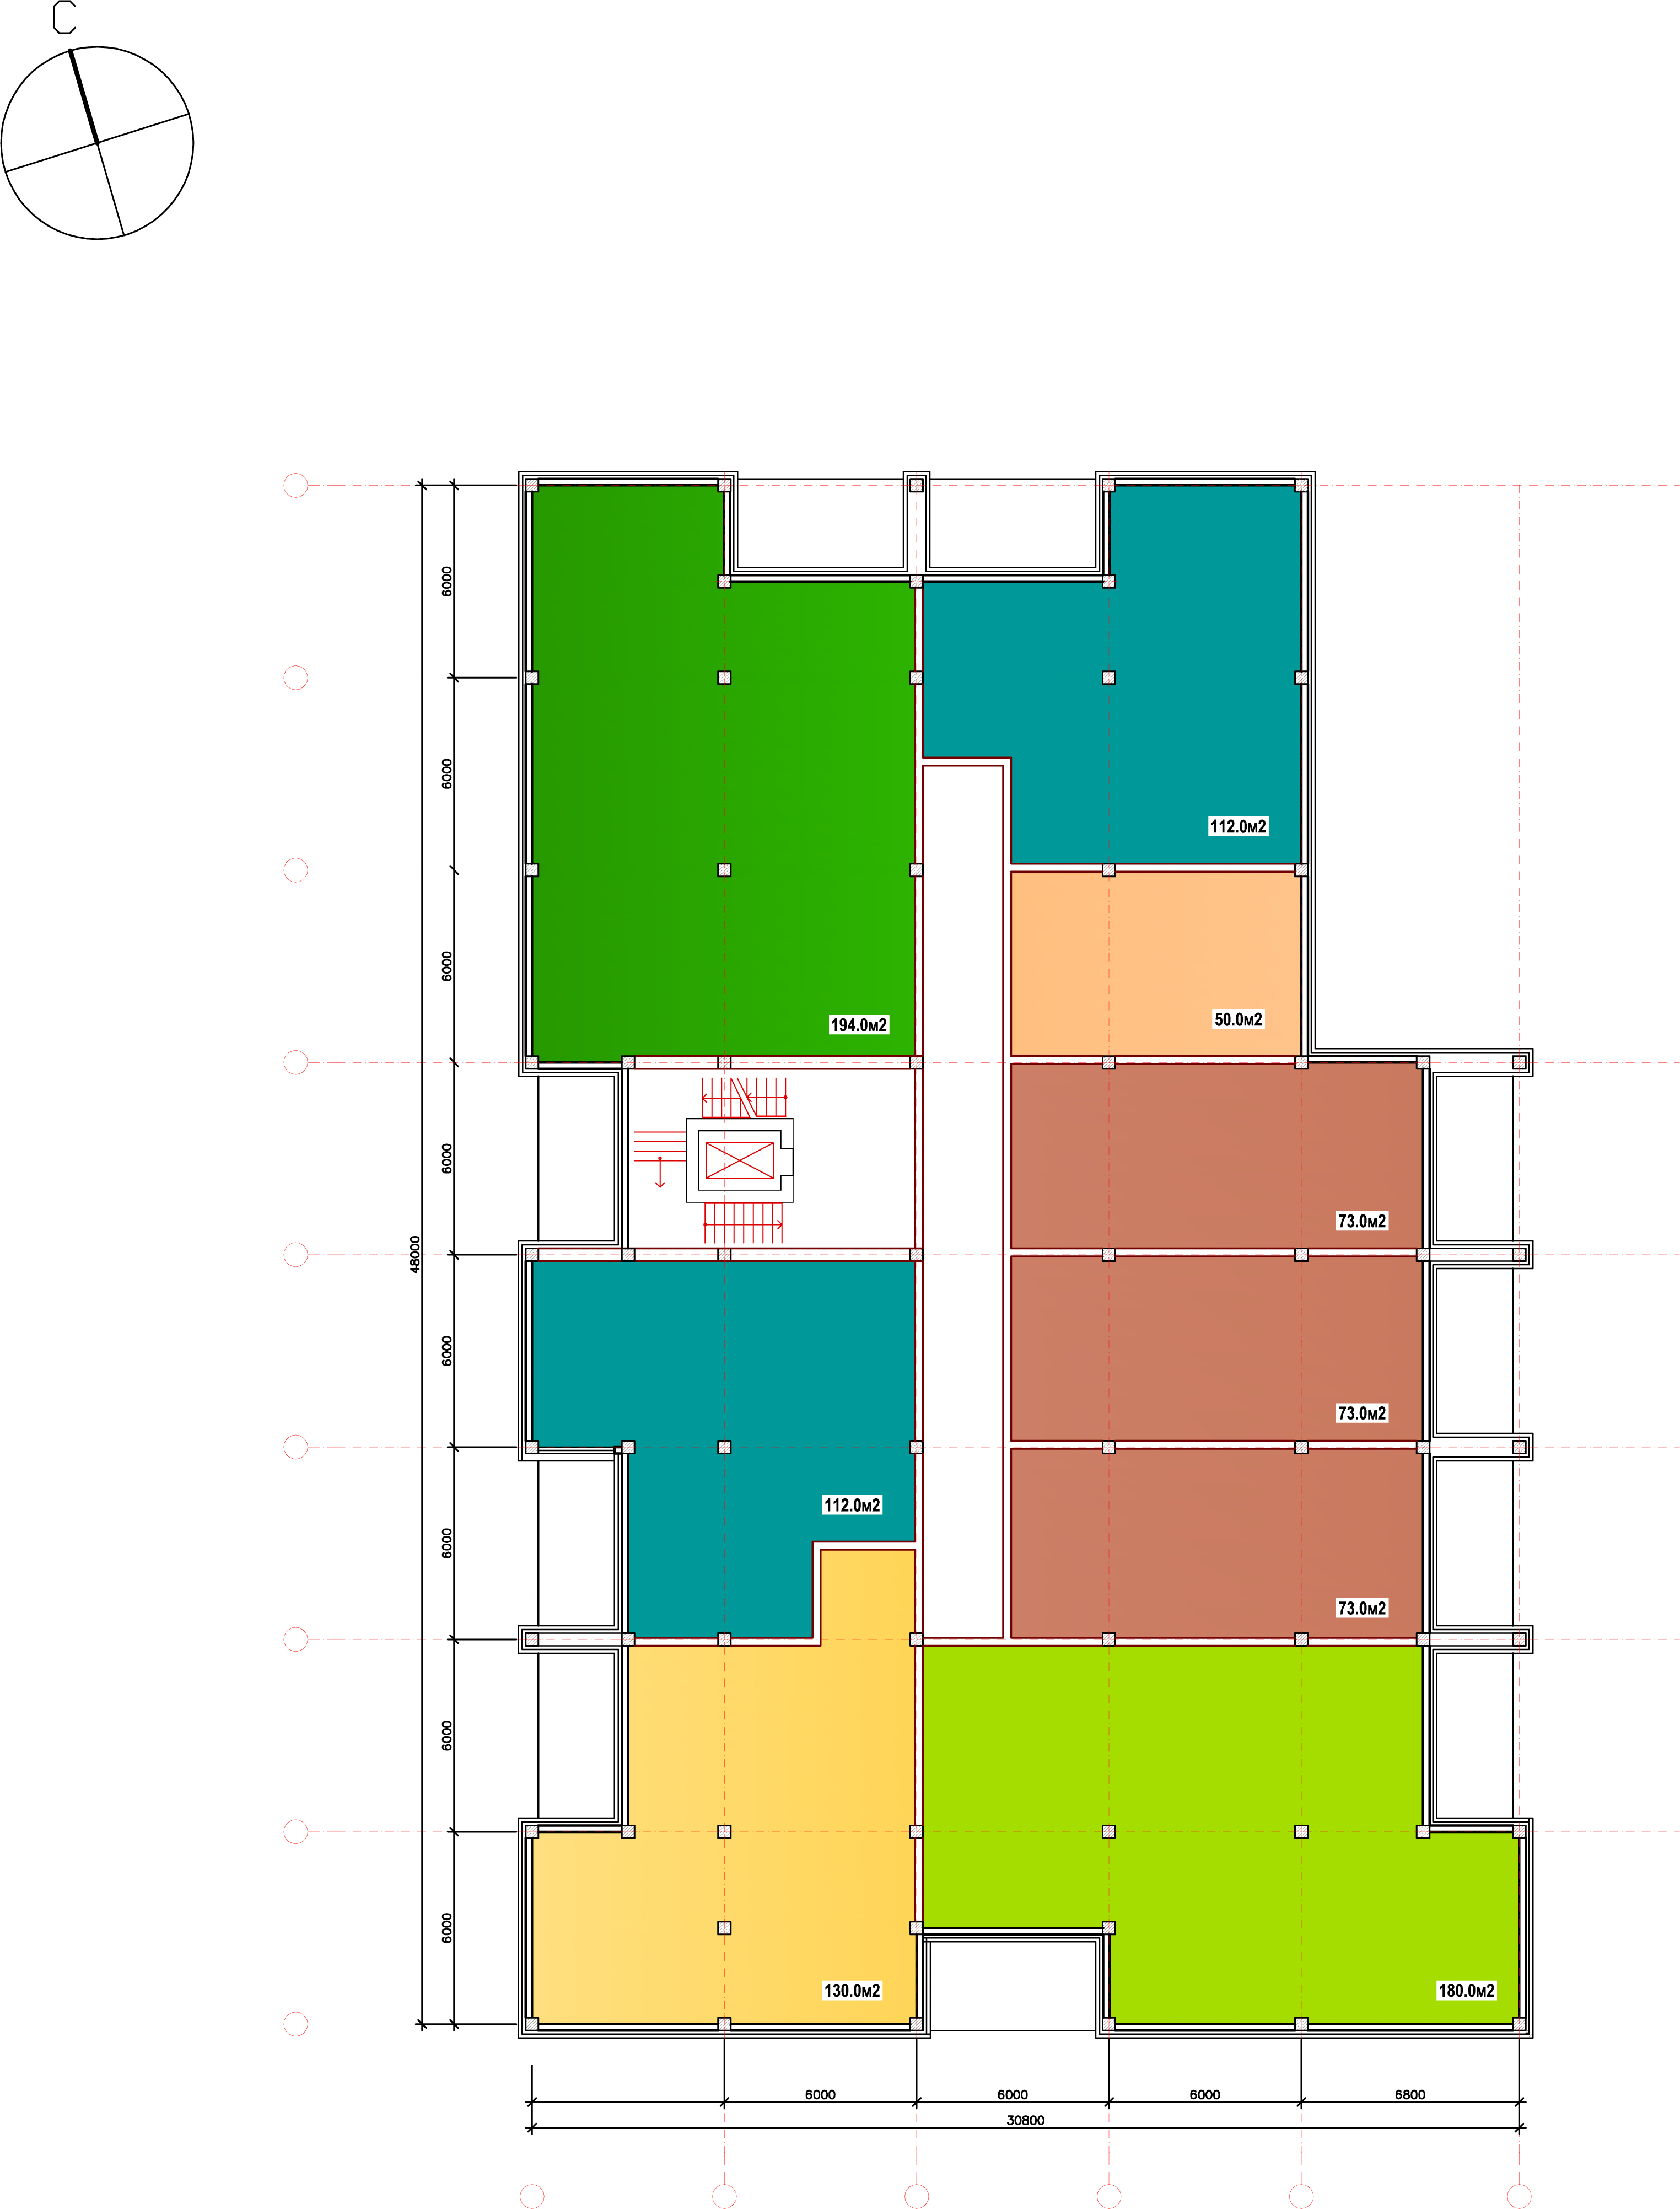 Разработка типового этажа многоквартирного дома! фото f_5205c25d94c23816.jpg